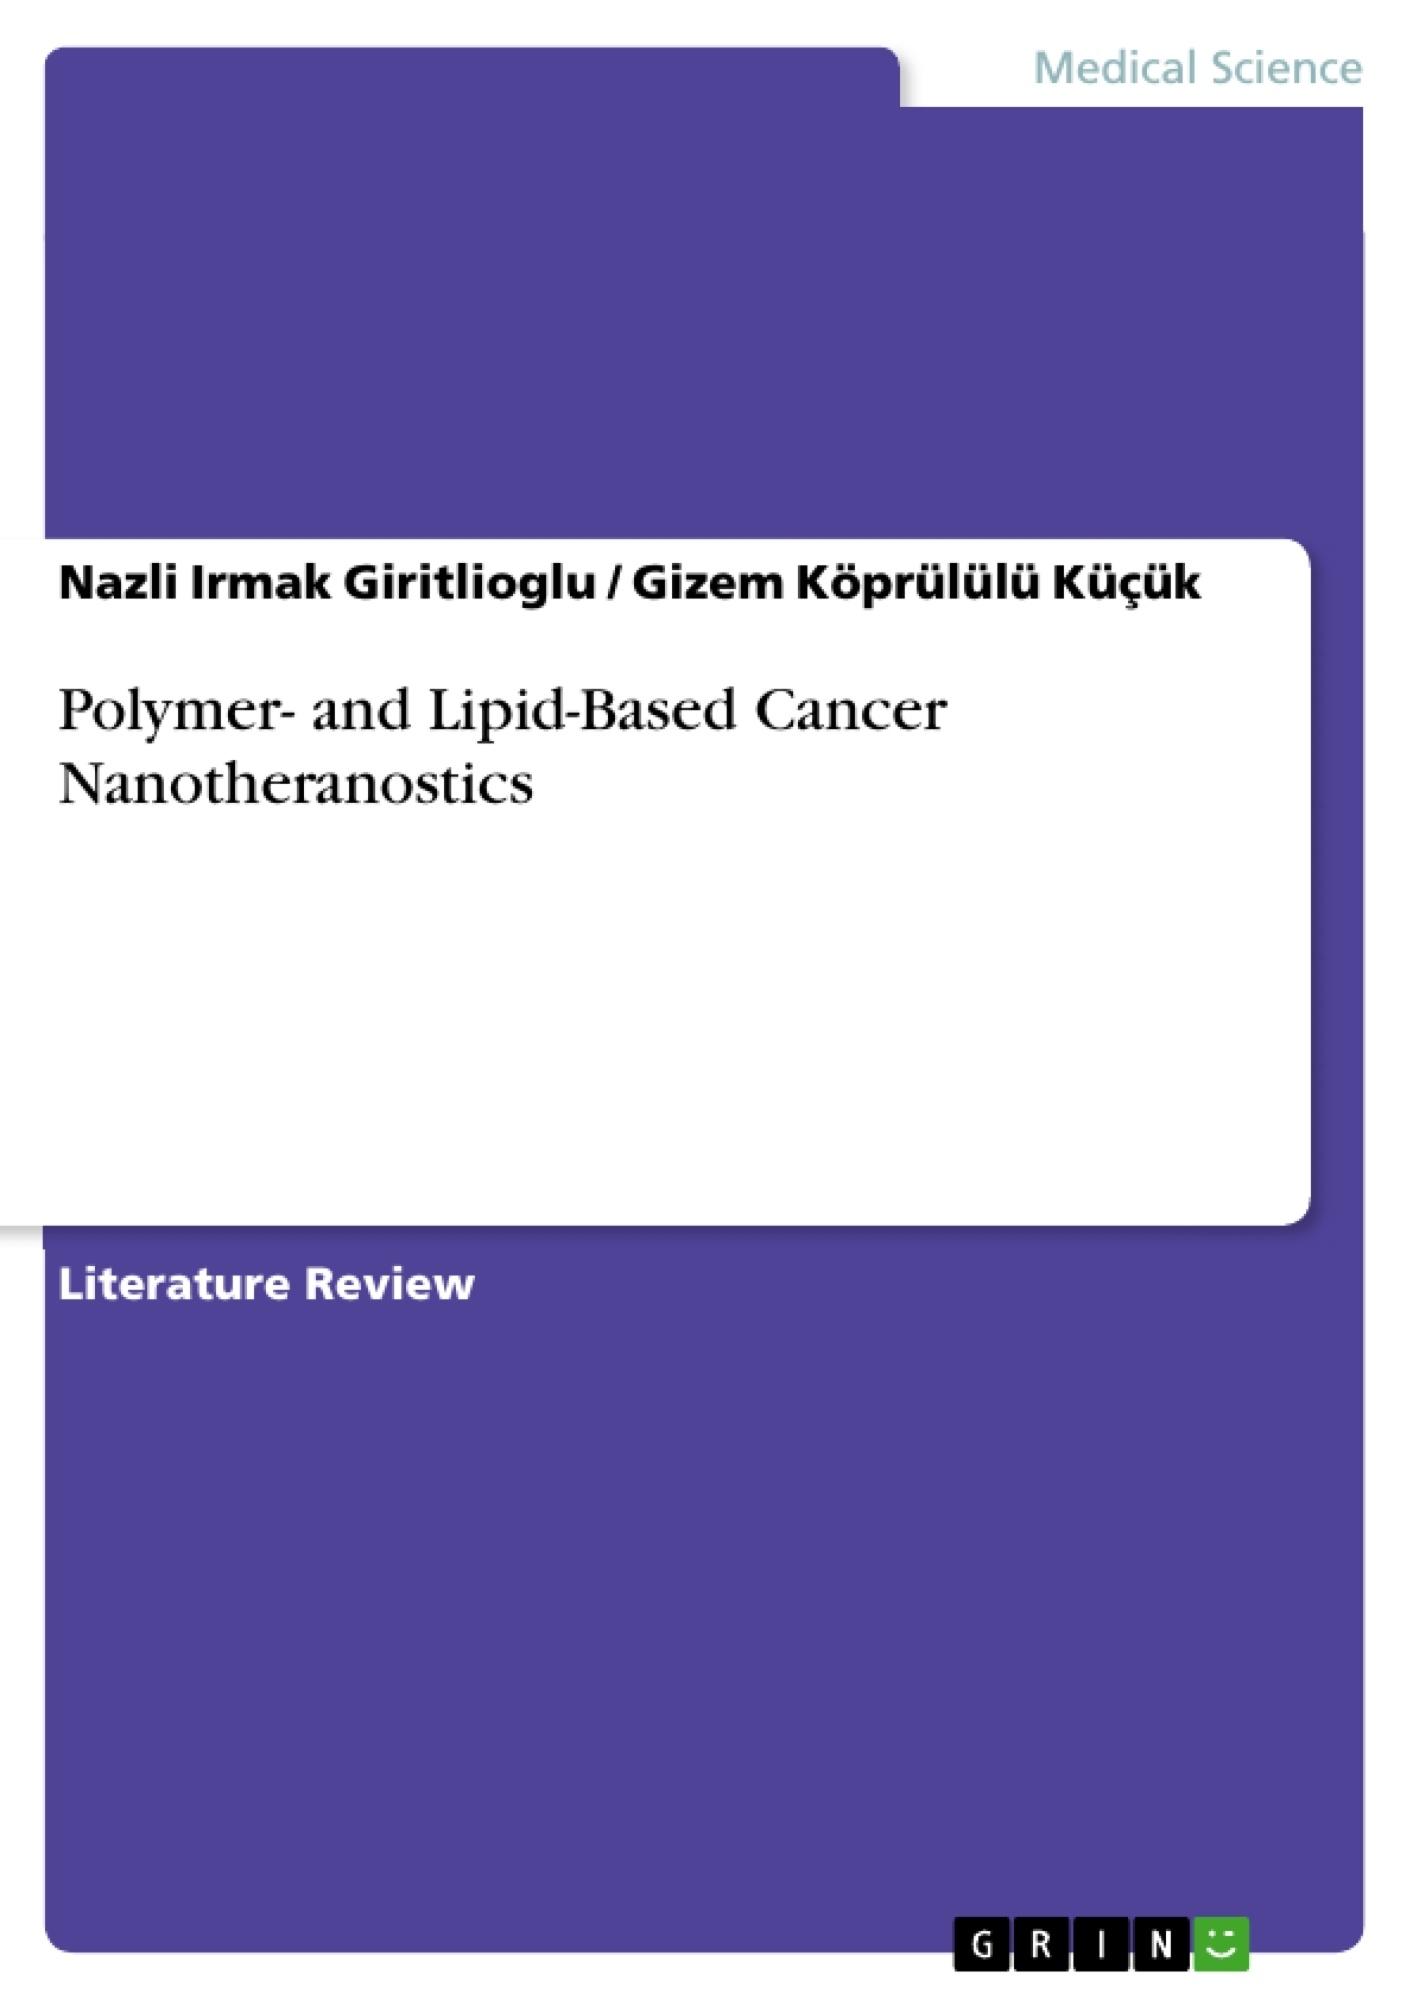 Title: Polymer- and Lipid-Based Cancer Nanotheranostics